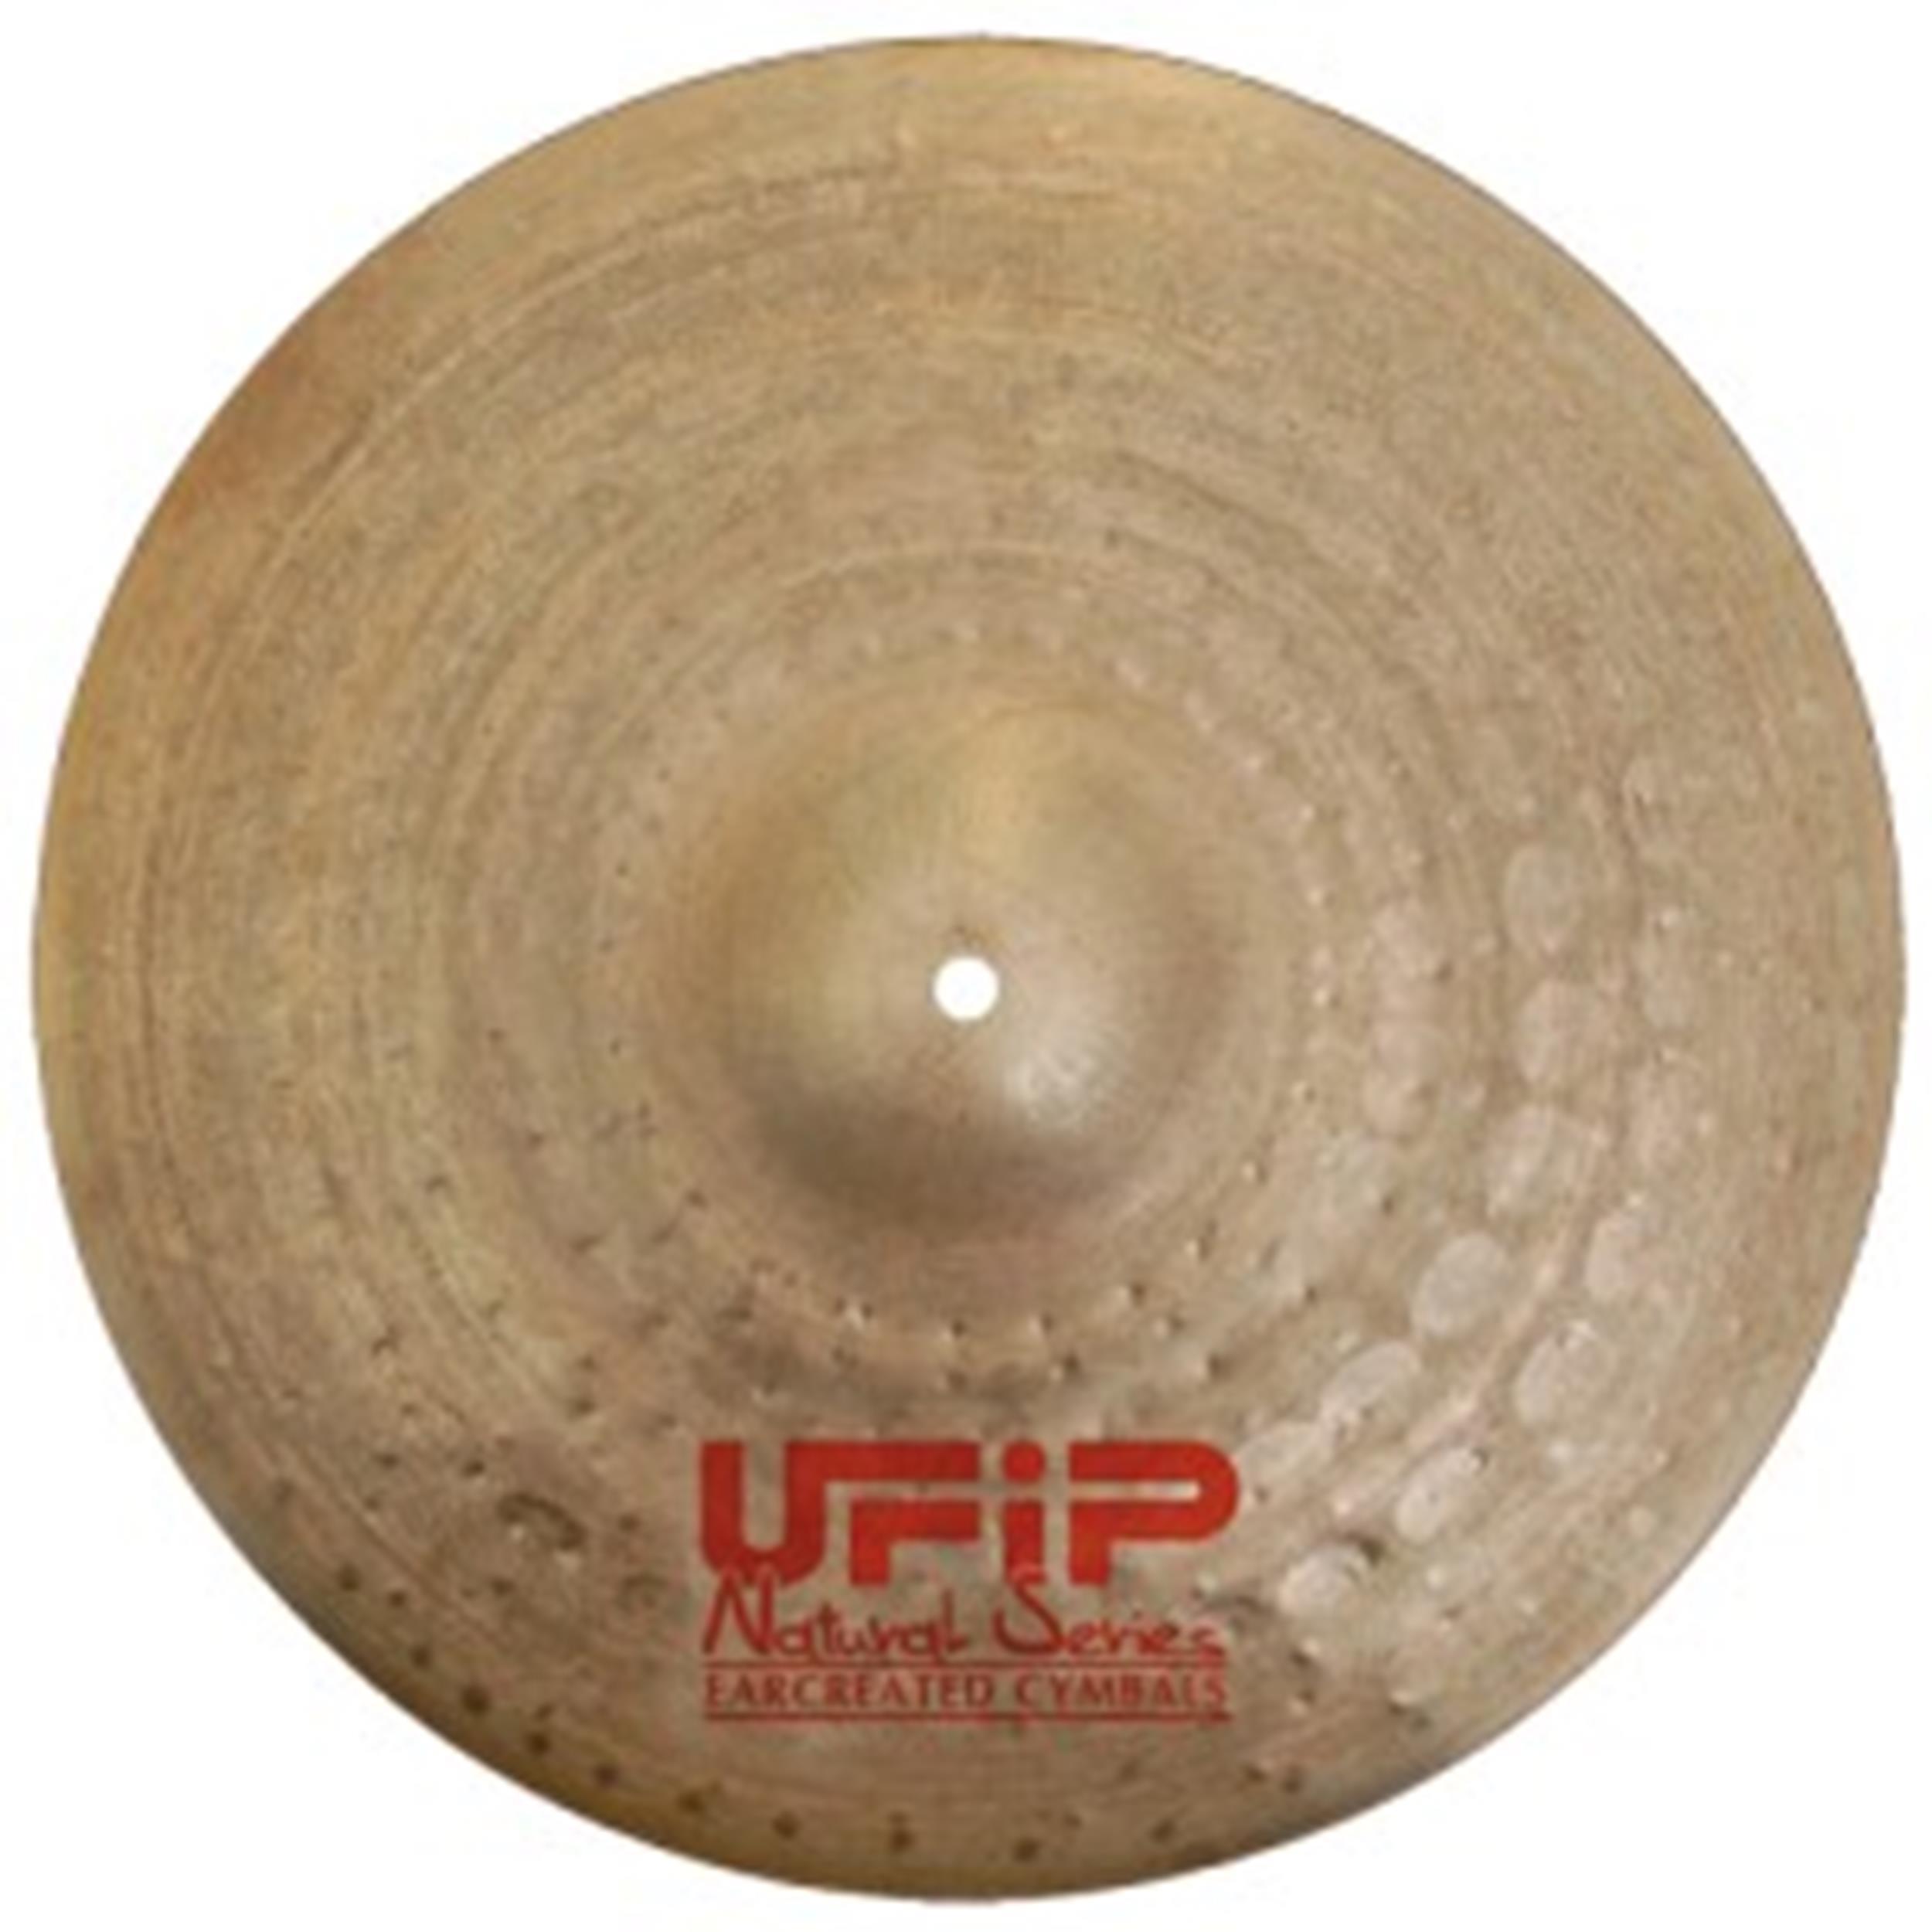 UFIP-NS-22LR-Natural-Series-22-Light-Ride-sku-45600149